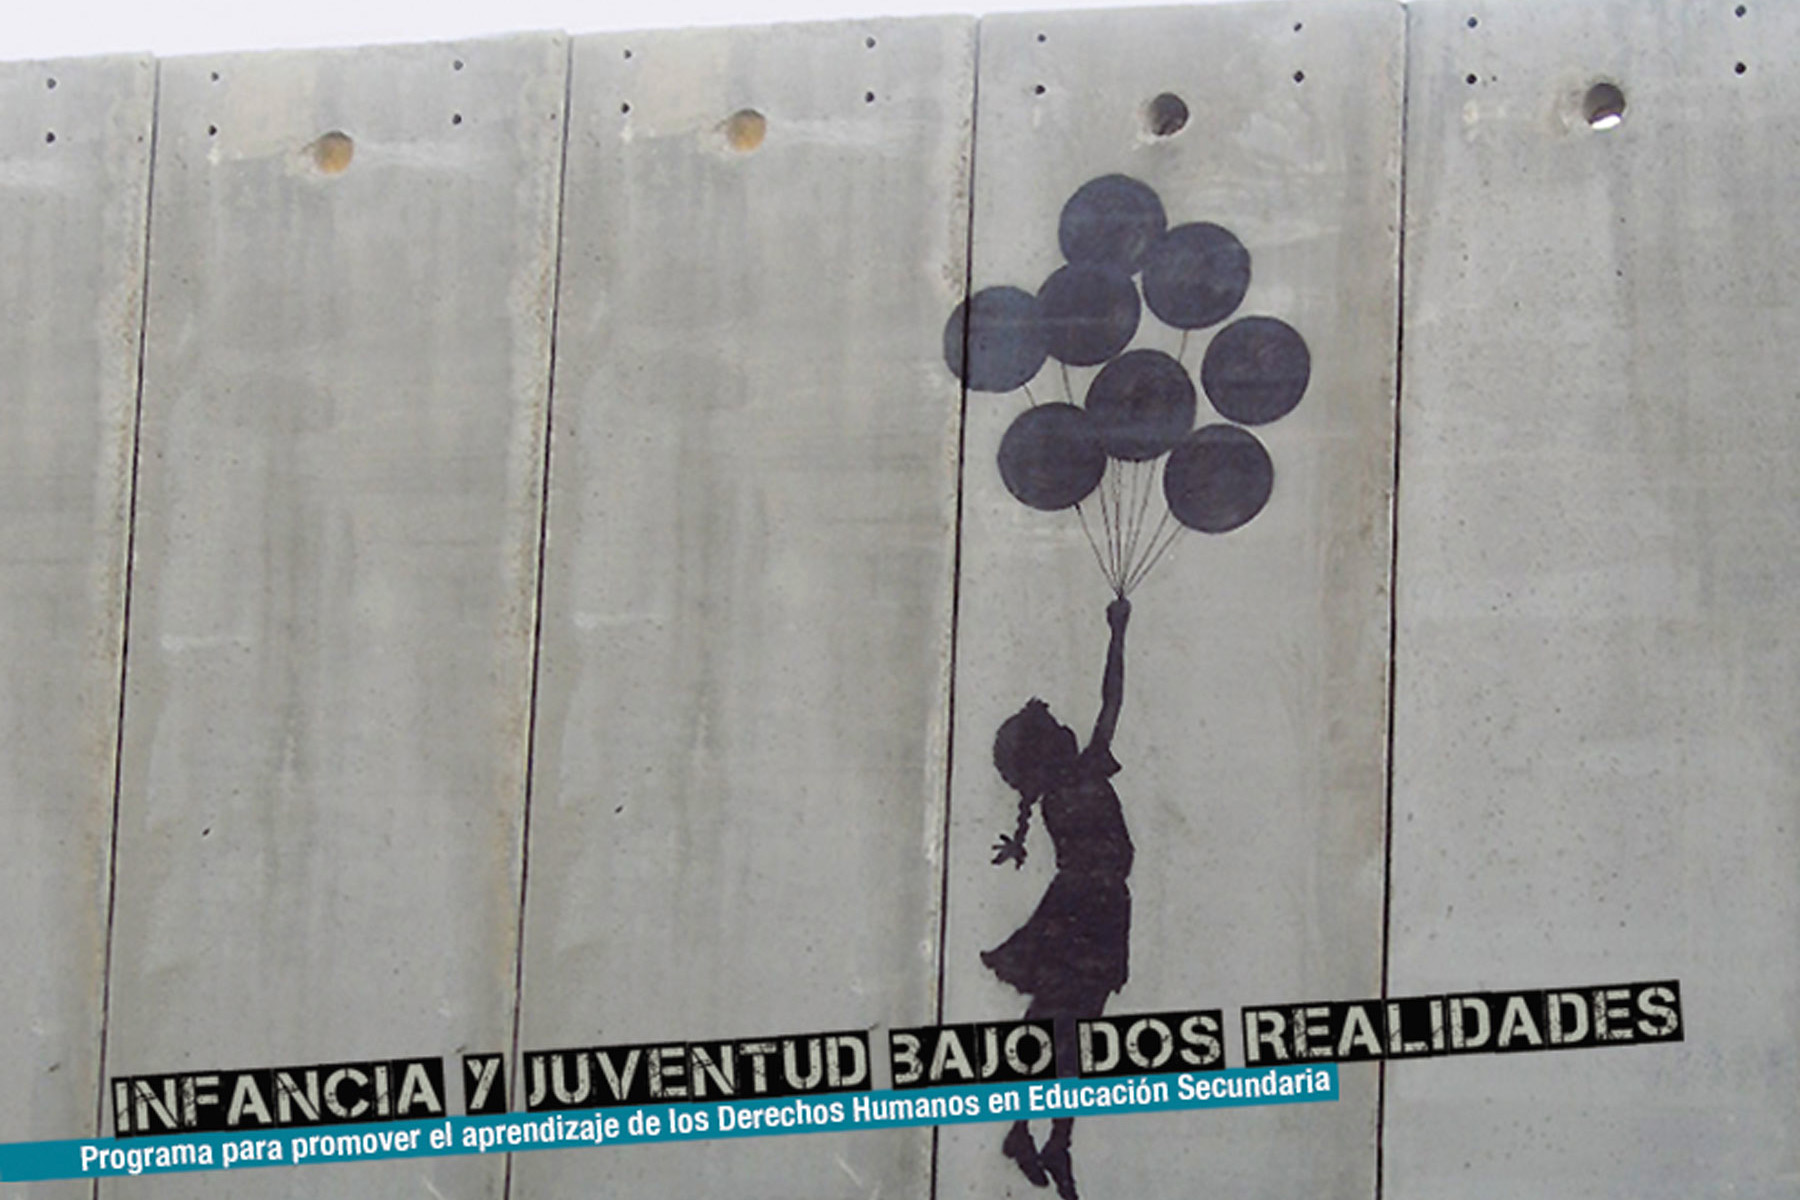 Imagen-Unrwa-Banksy-Refugiados